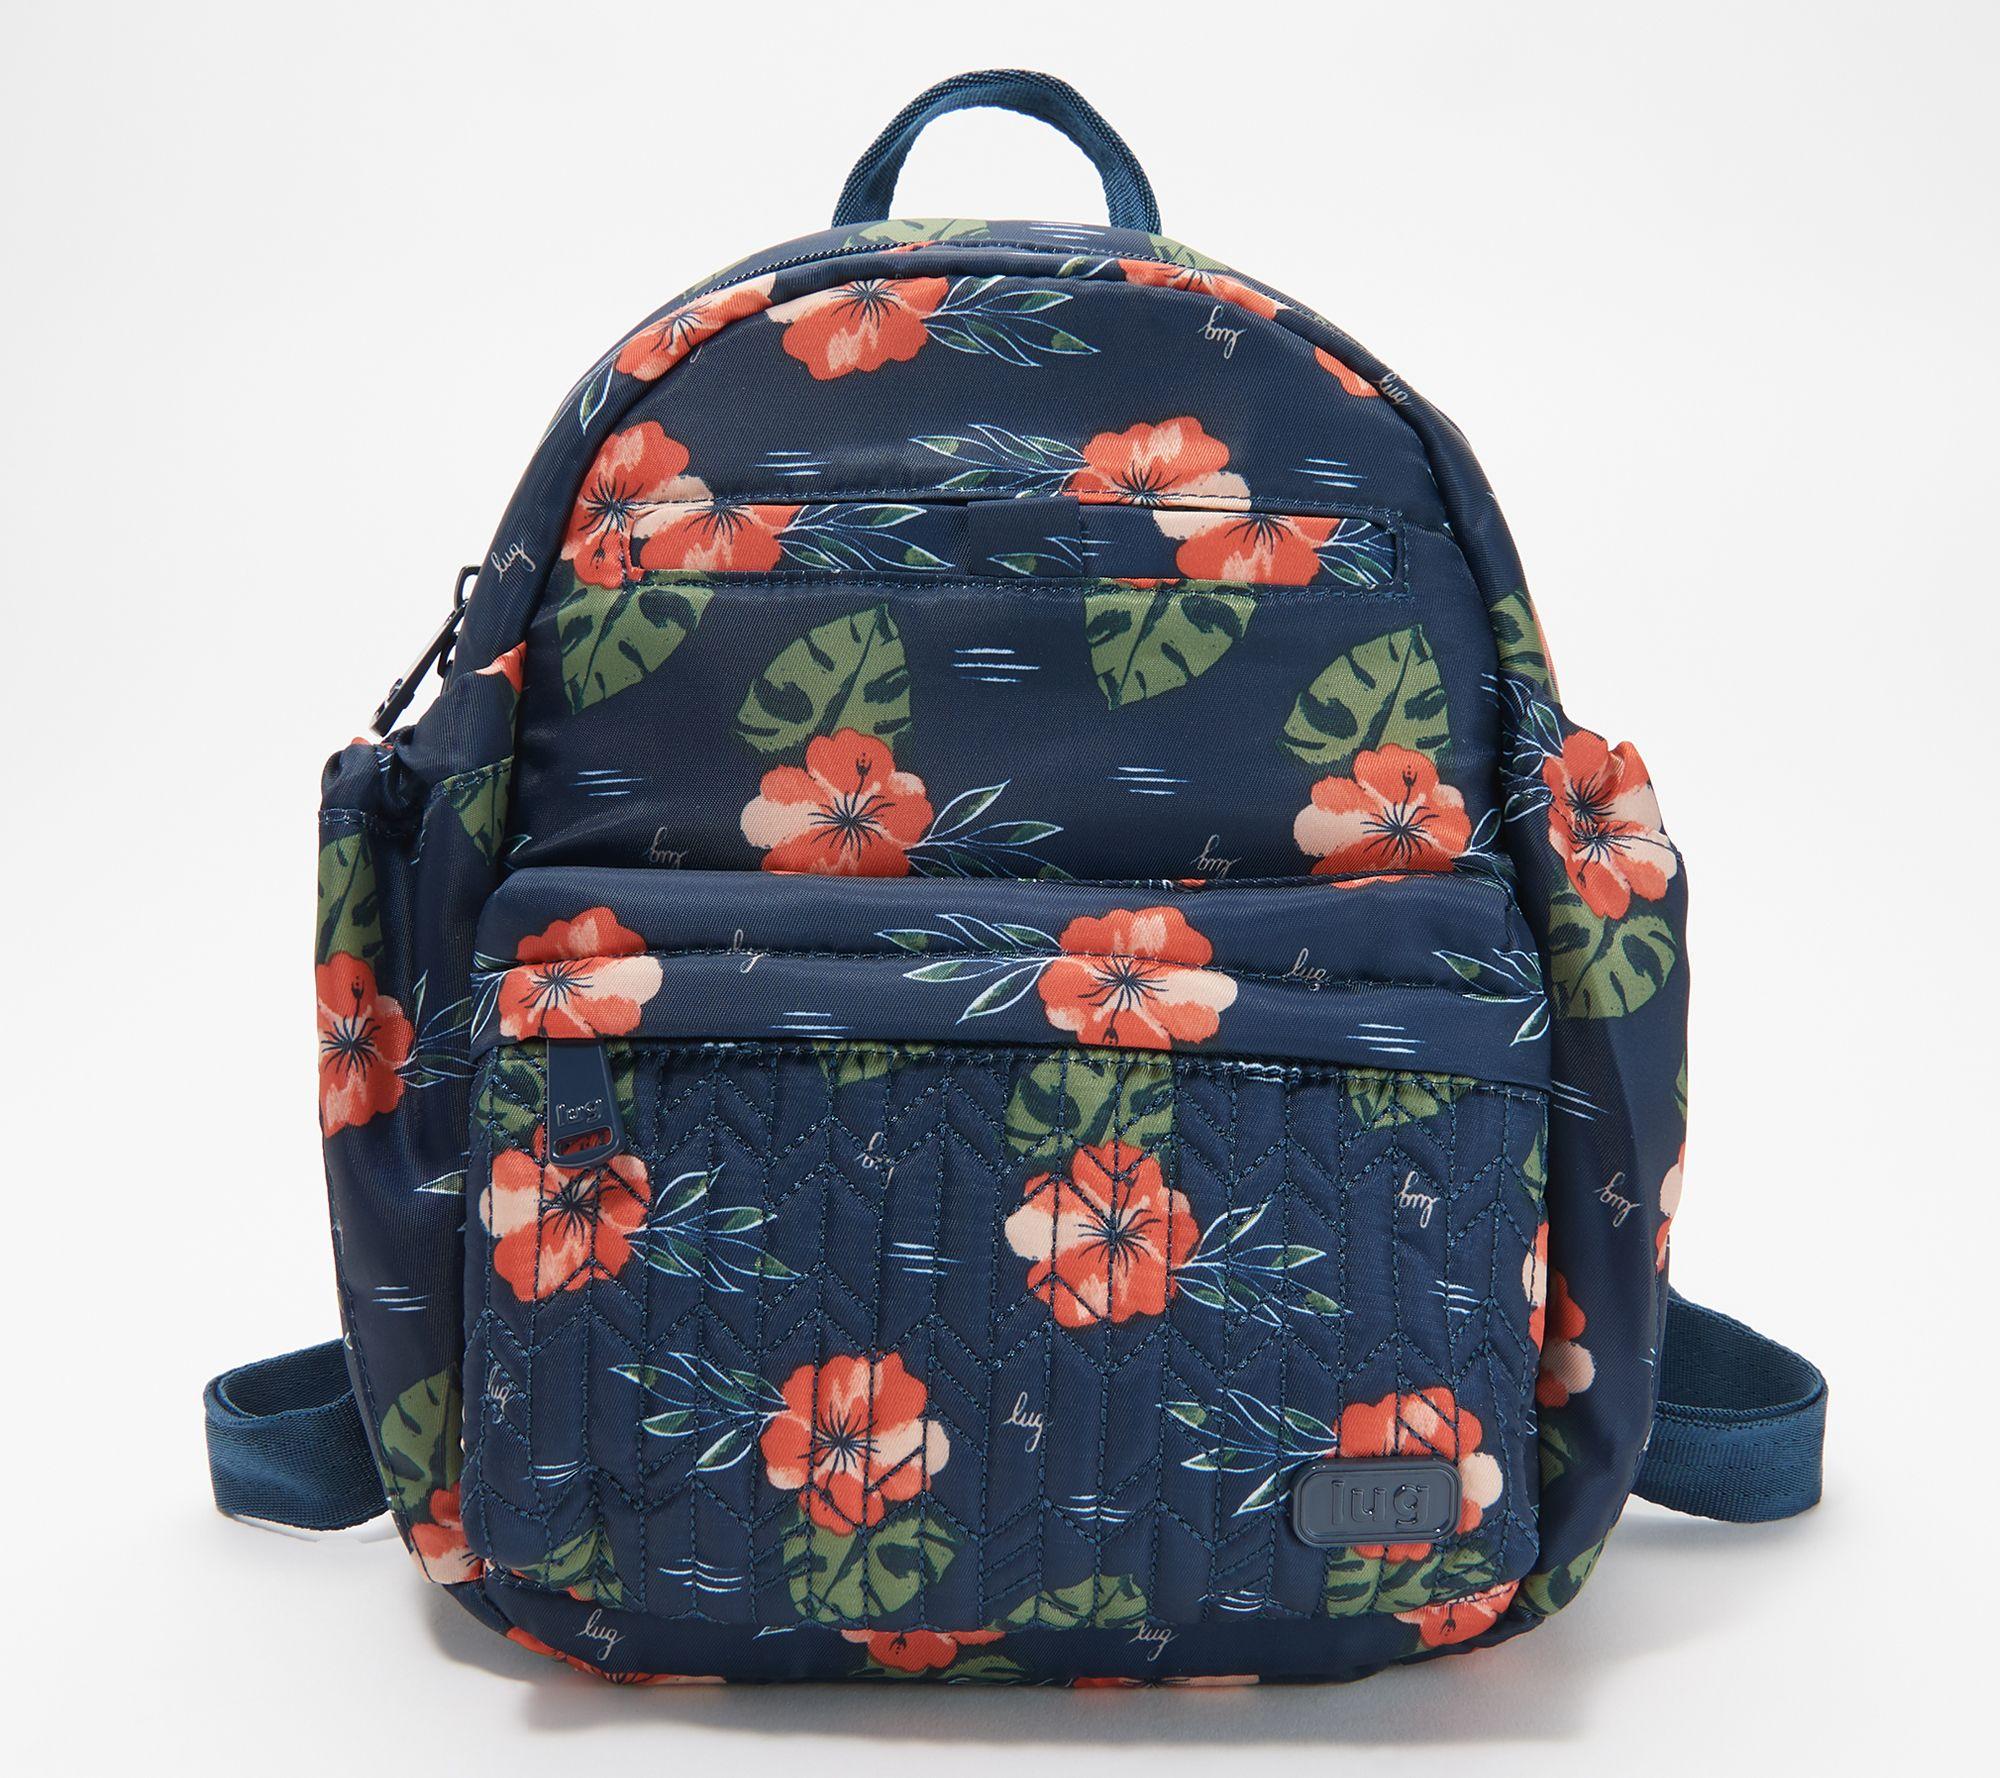 c6ef99289 Lug Small Backpack - Orbit - Page 1 — QVC.com